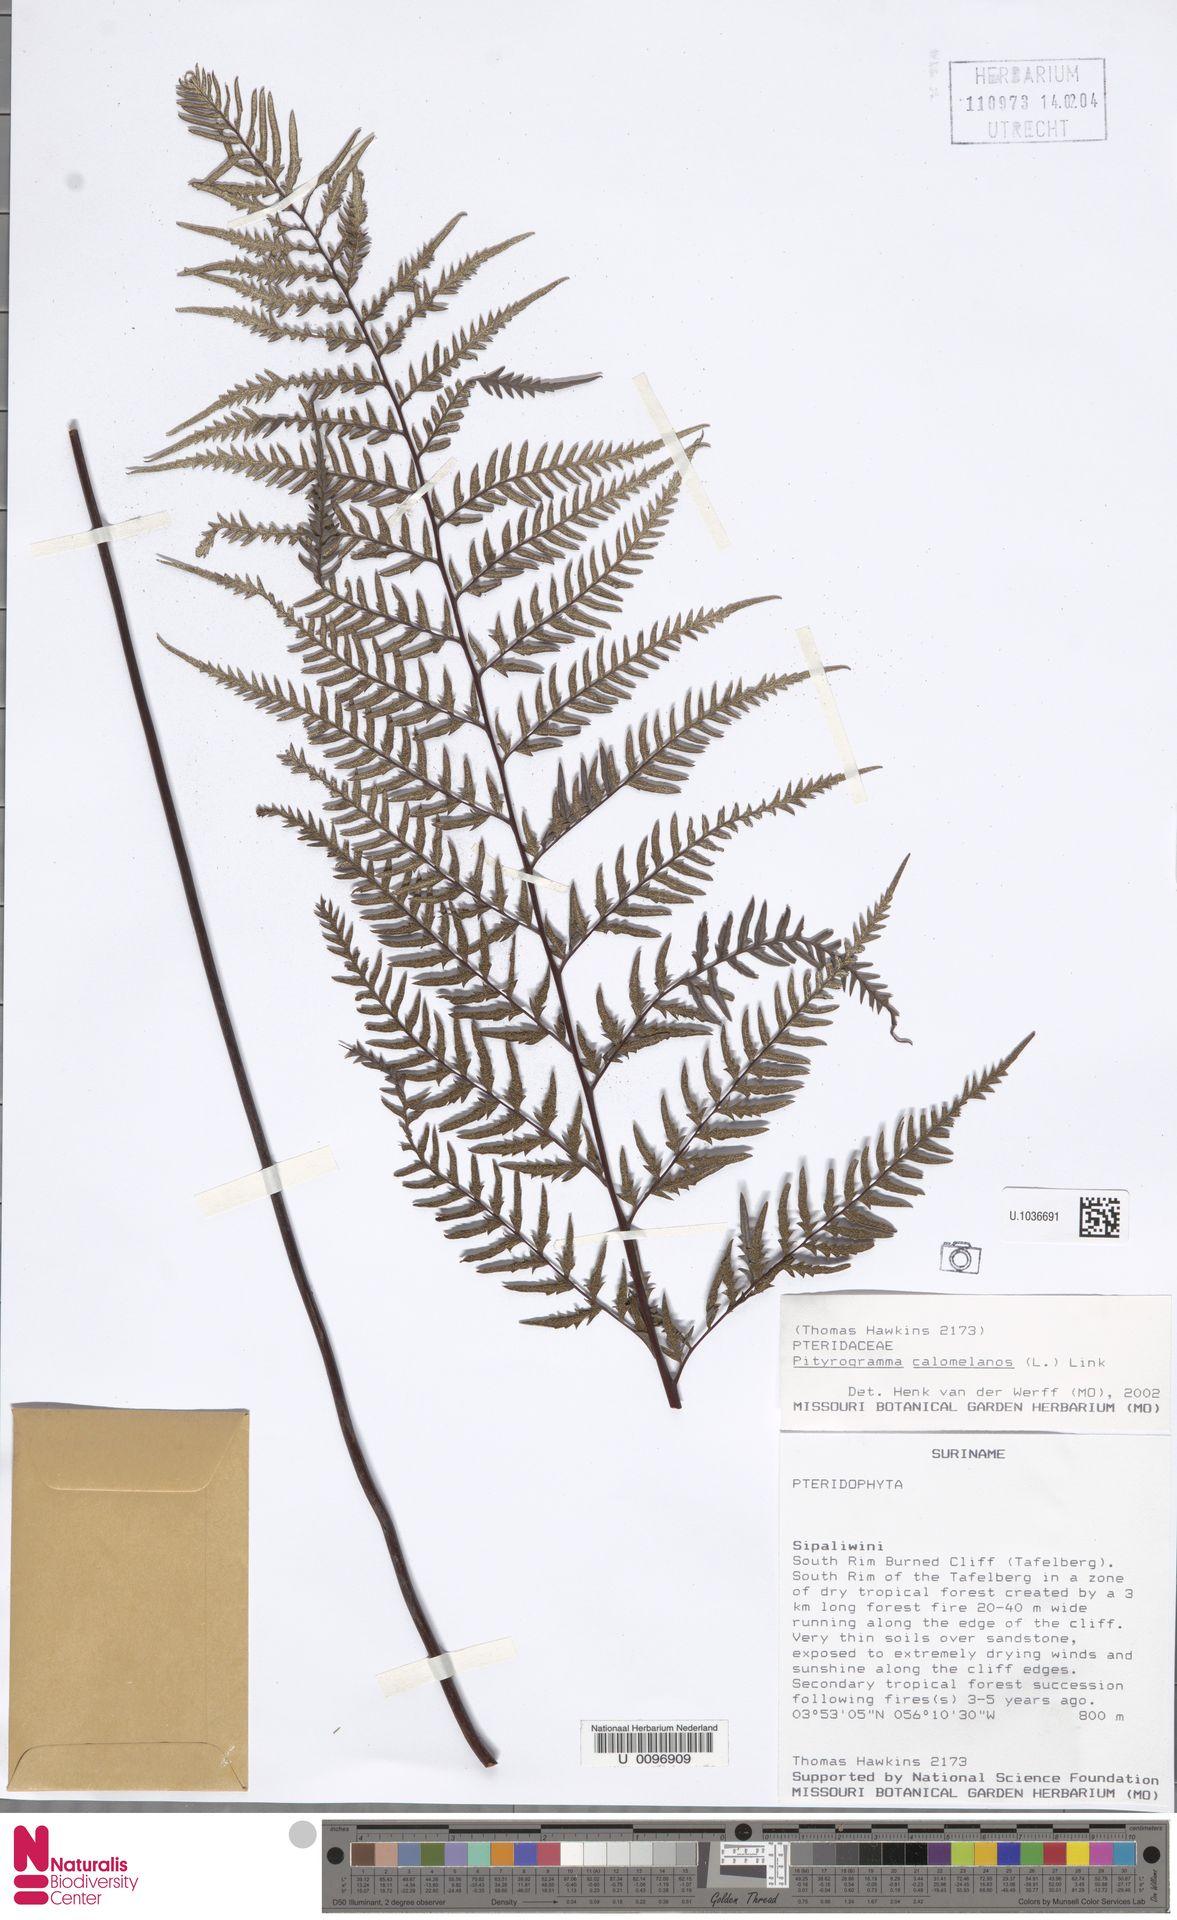 U.1036691 | Pityrogramma calomelanos (L.) Link